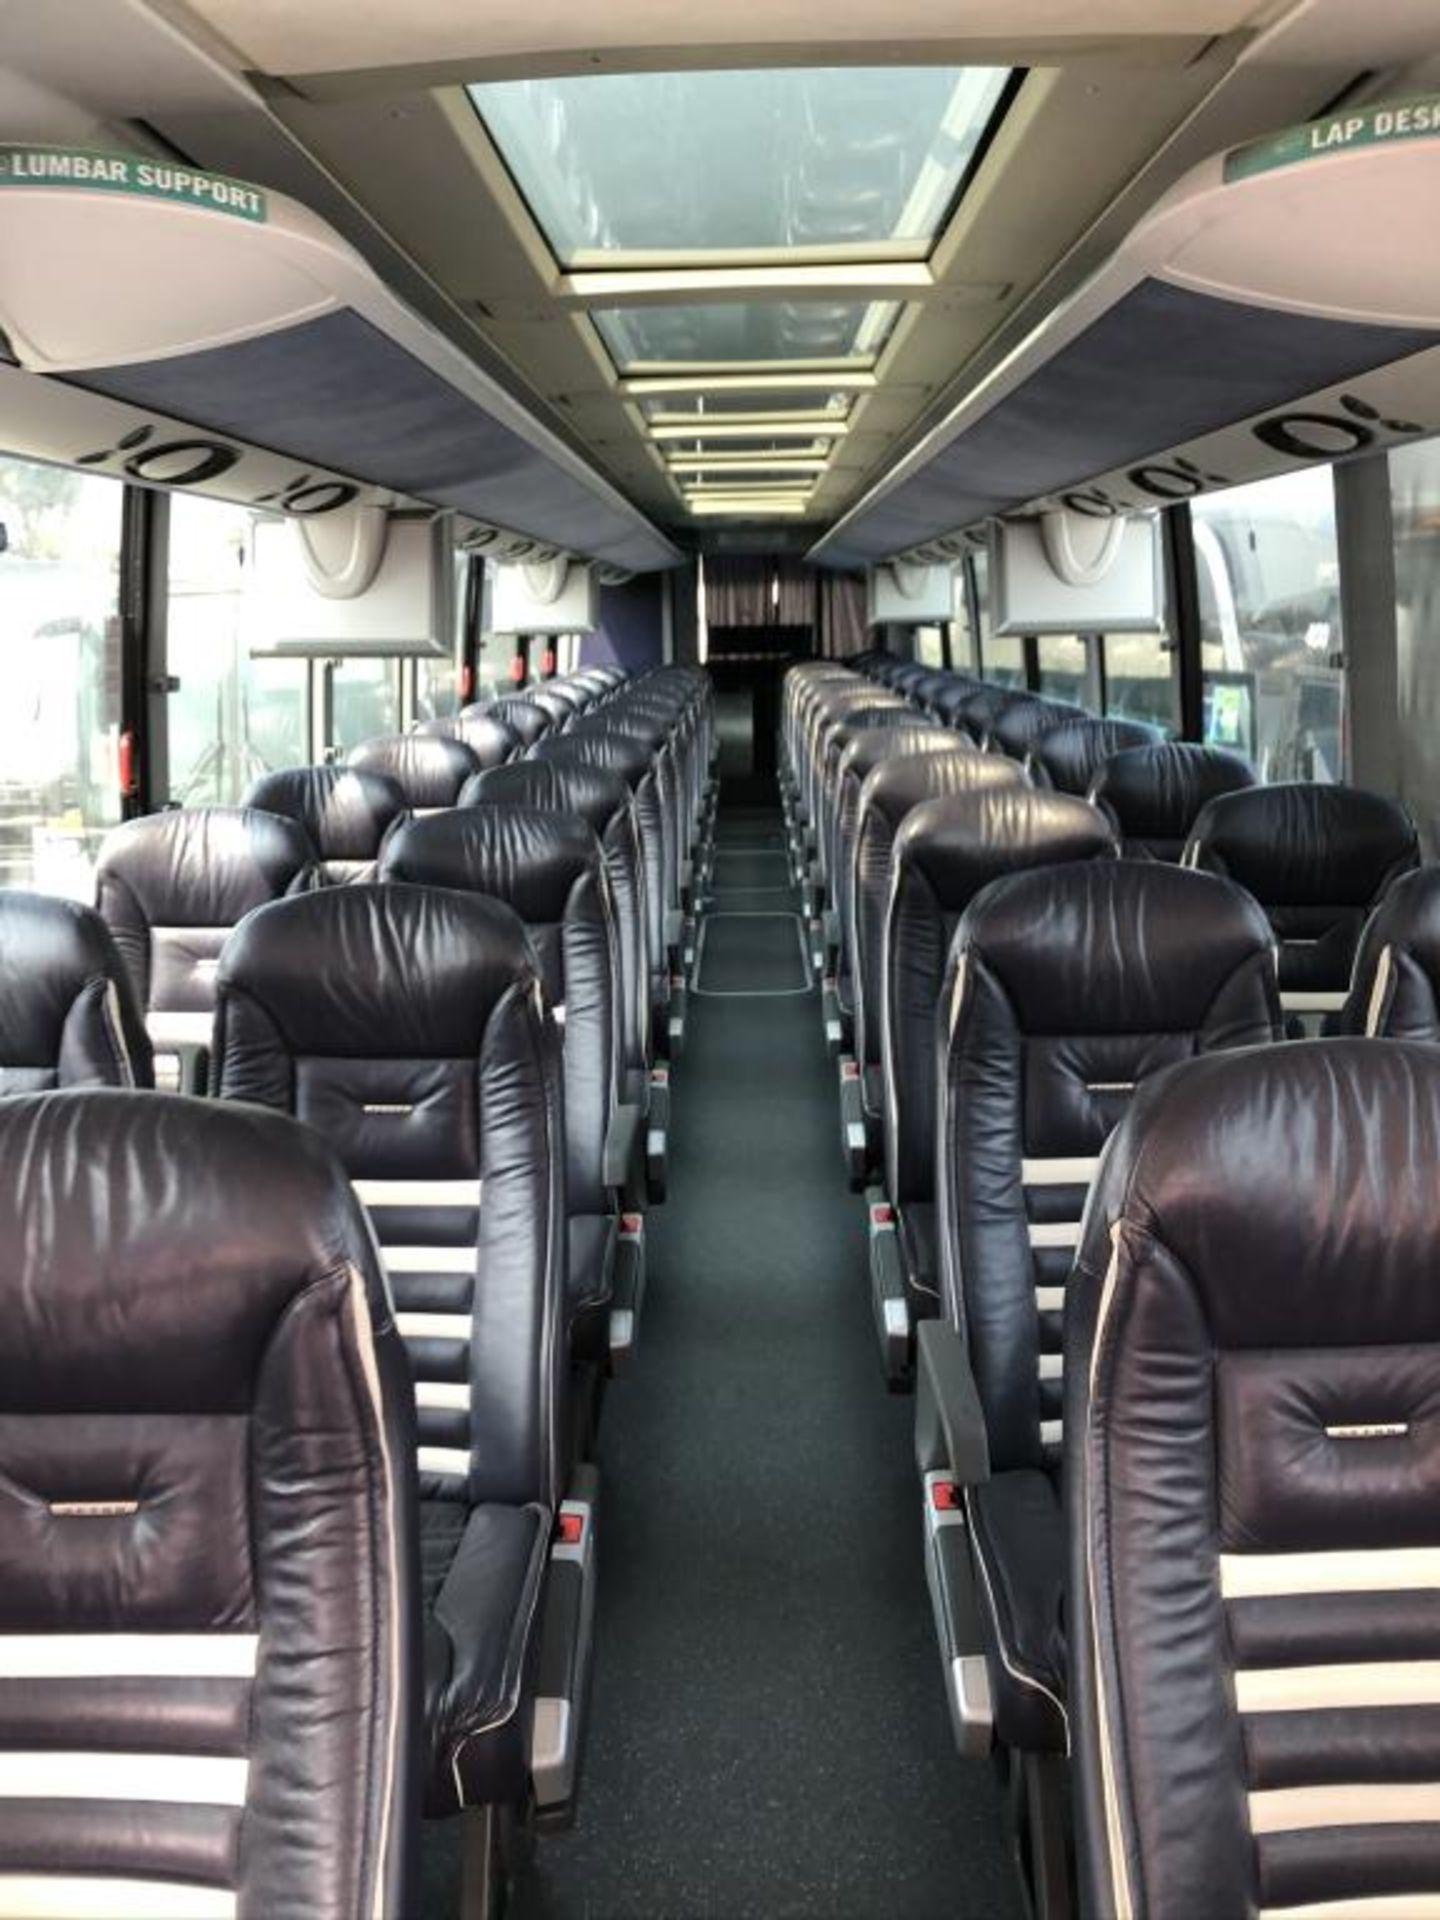 Motor Coach - Image 11 of 19